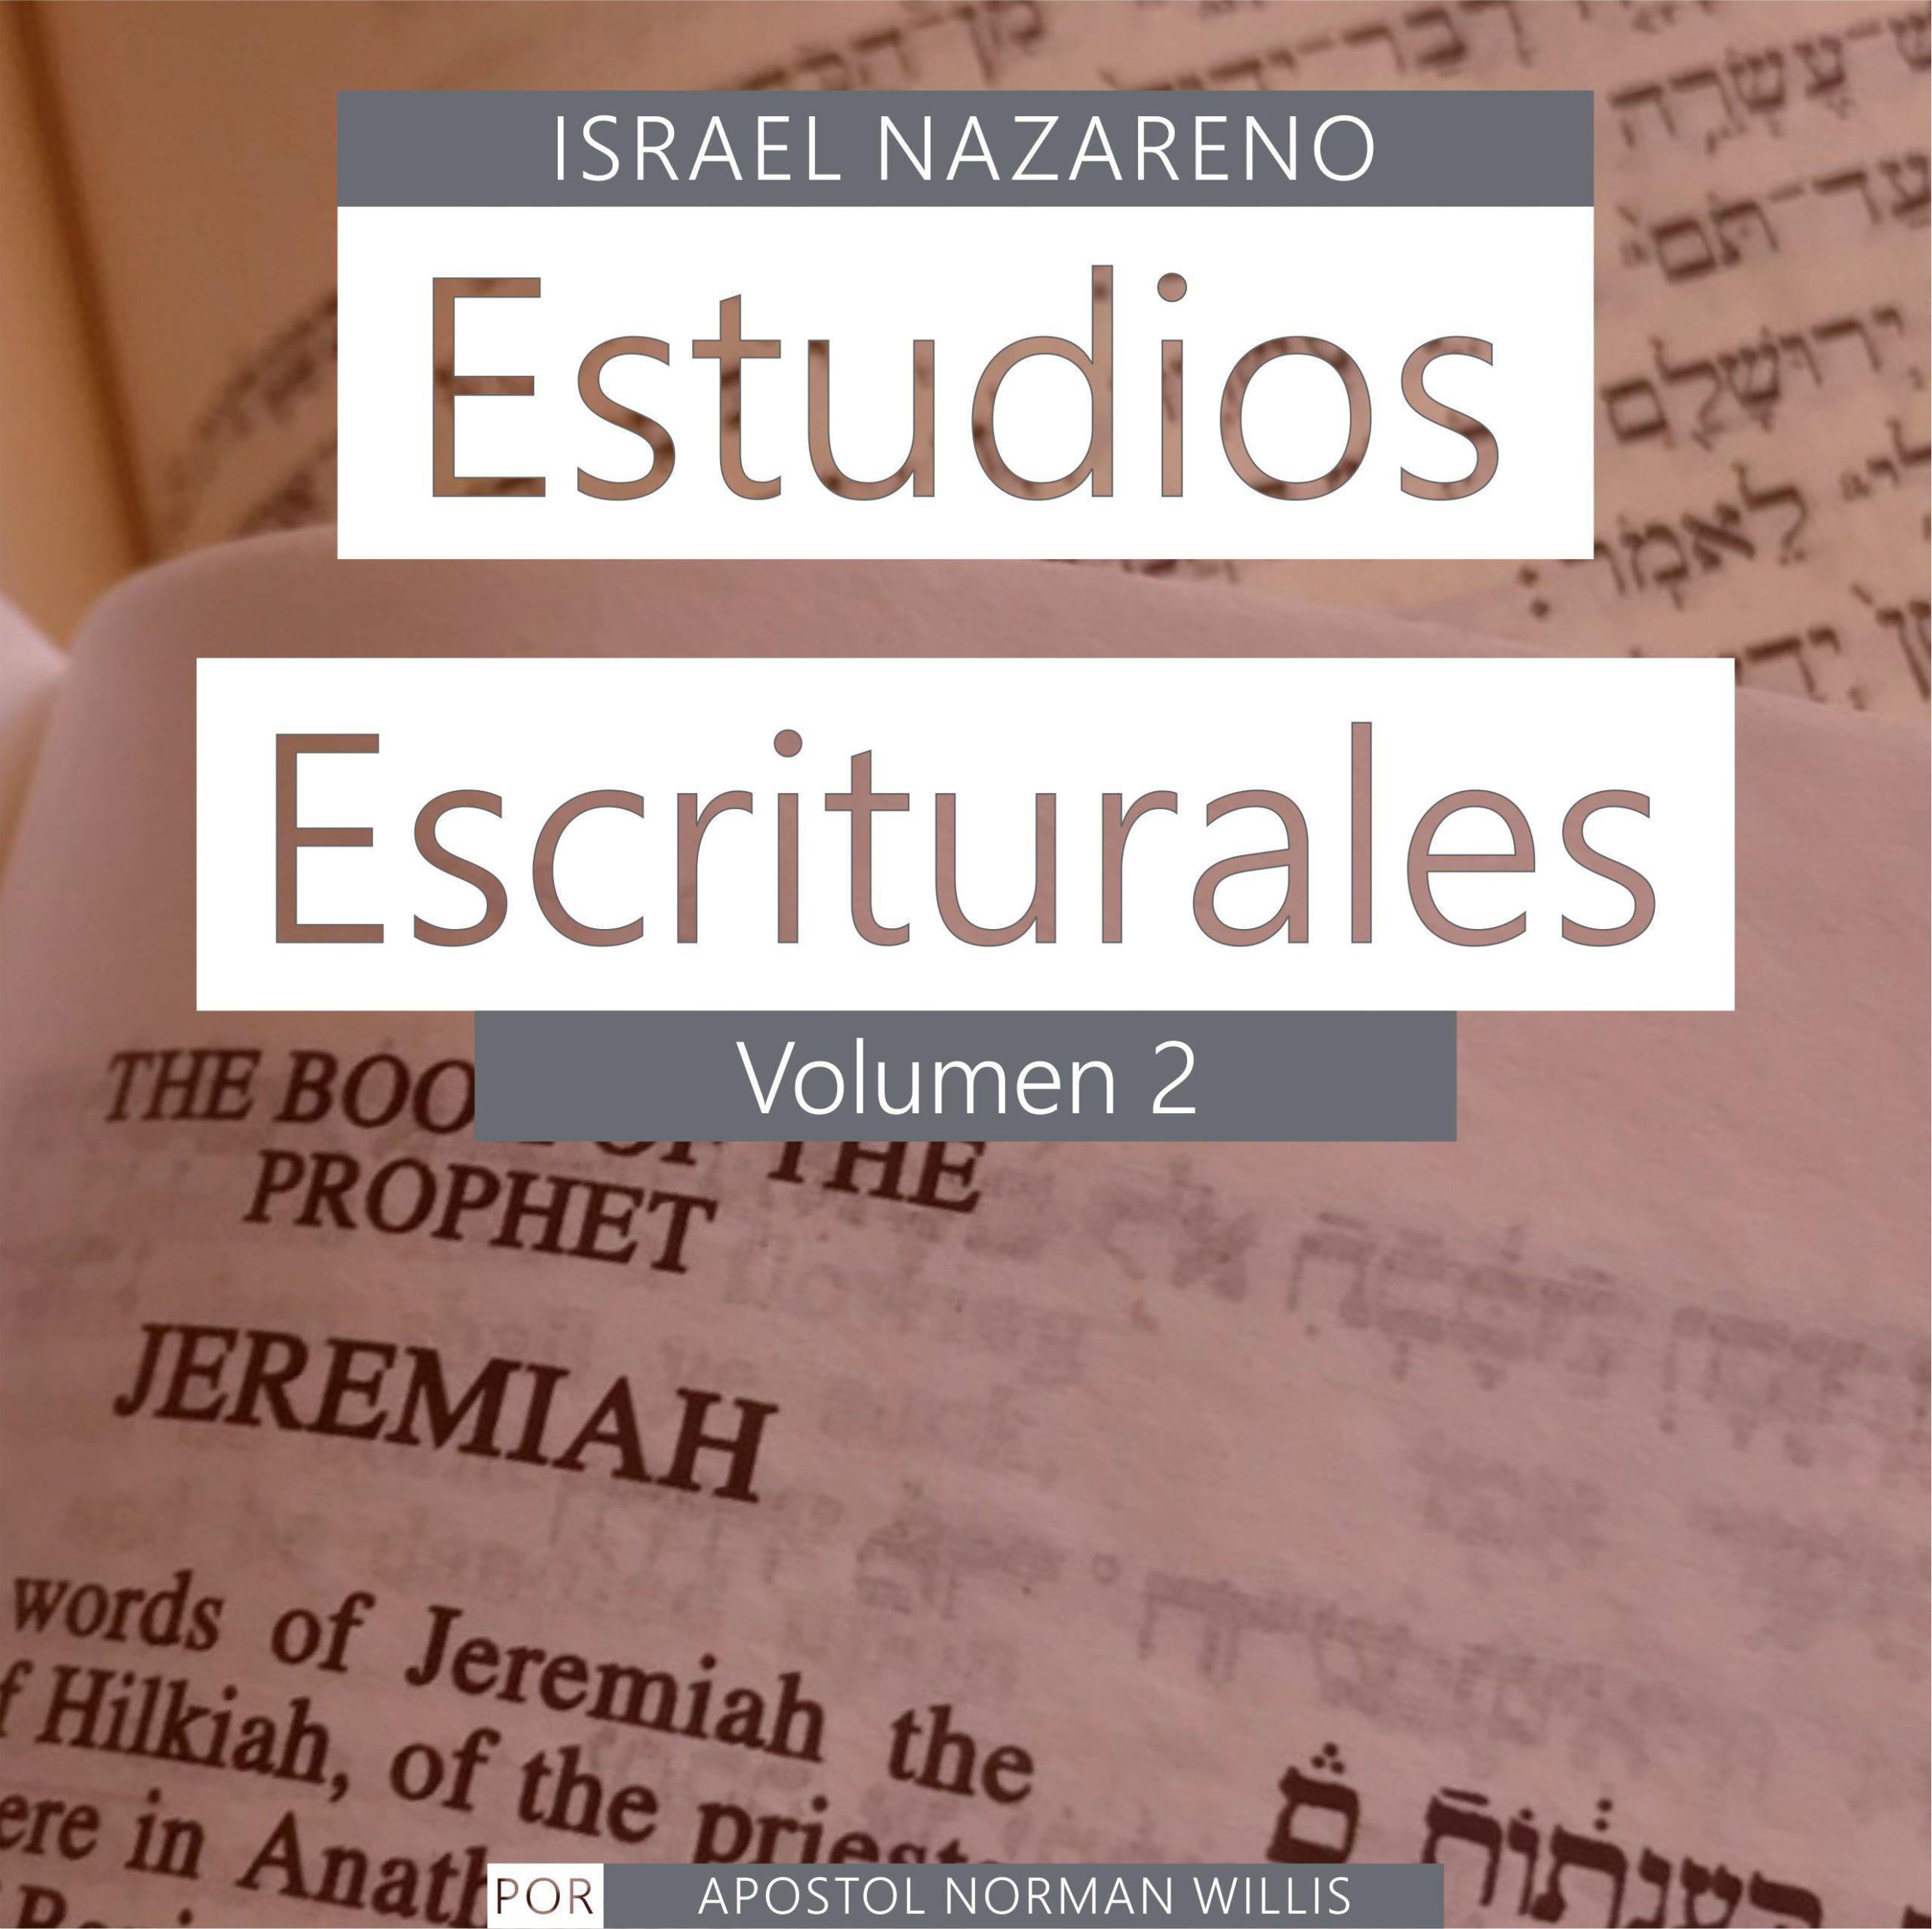 Estudios Escriturales Nazarenos Vol. 2